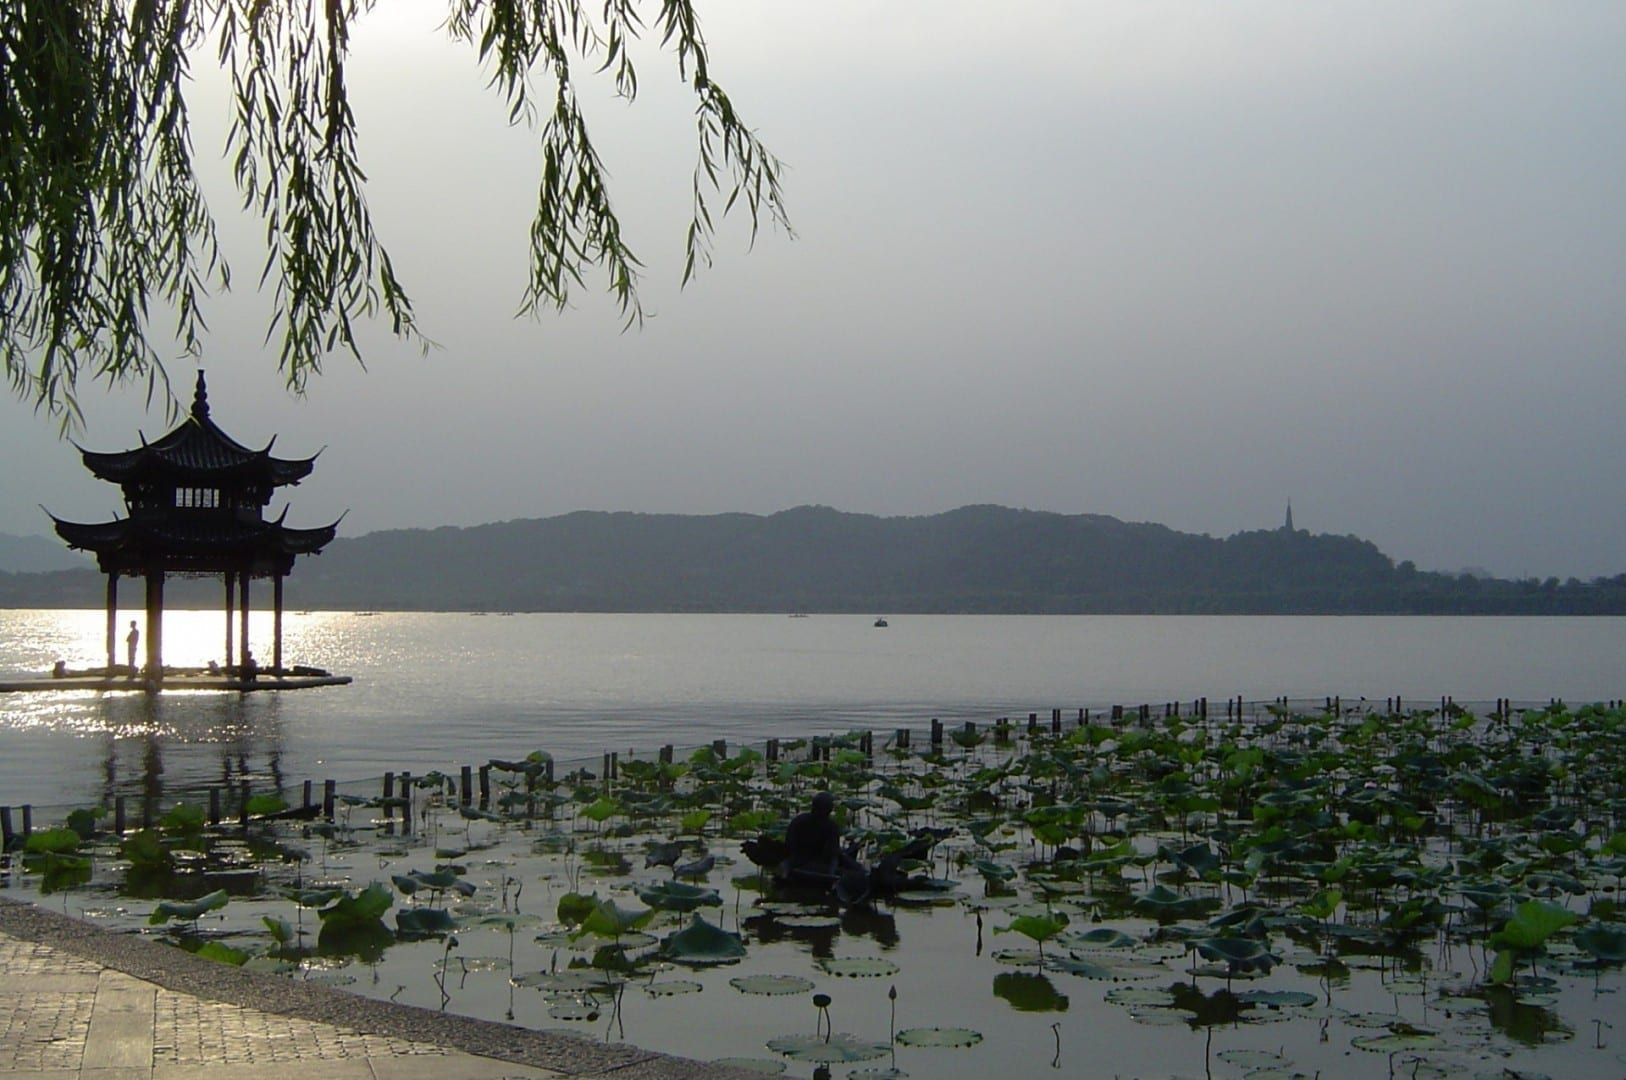 Vista sobre el Lago Oeste Hangzhou China